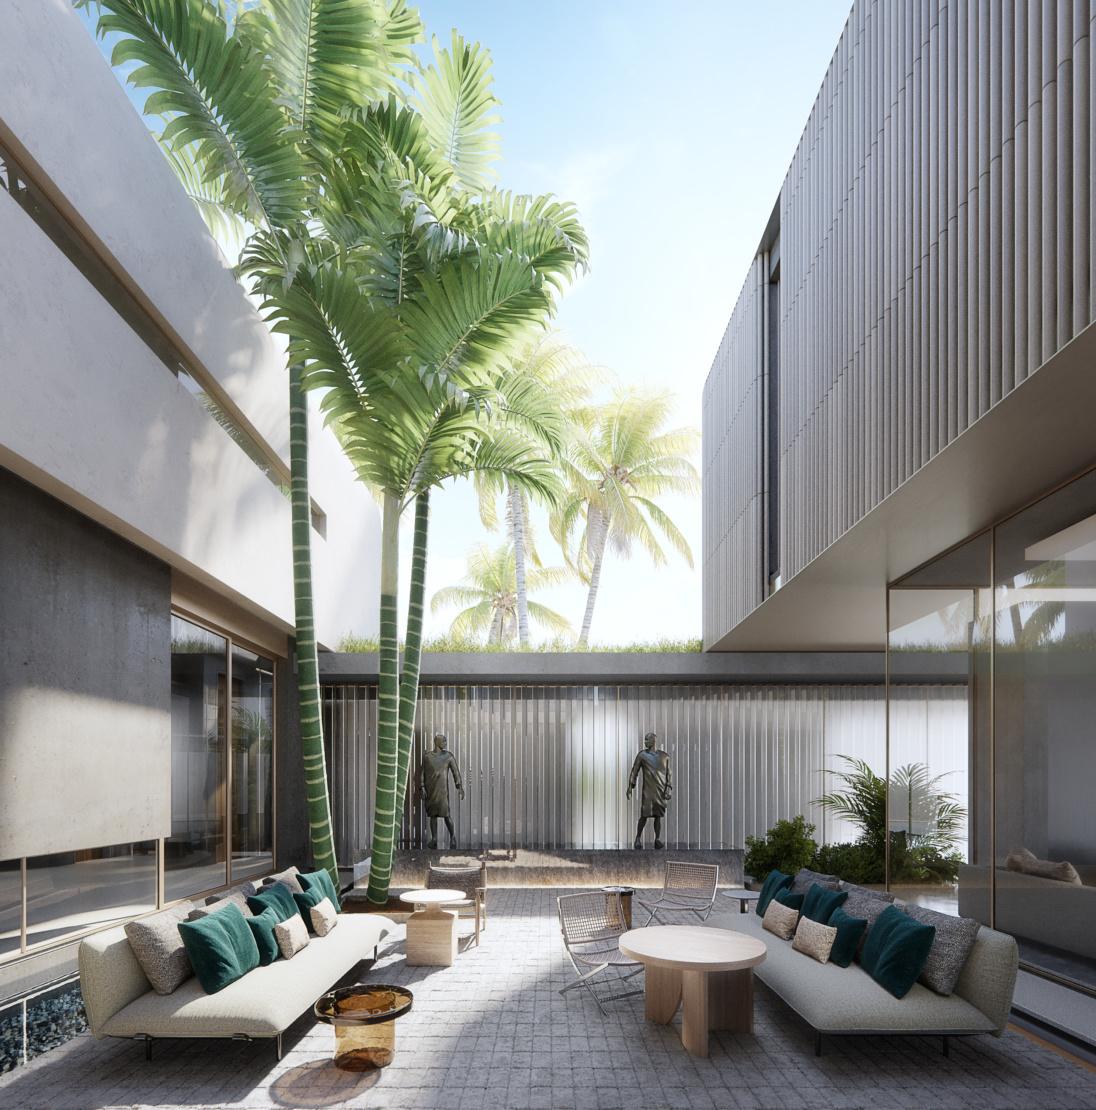 The courtyard. Image by Azeez Bakare Studios.